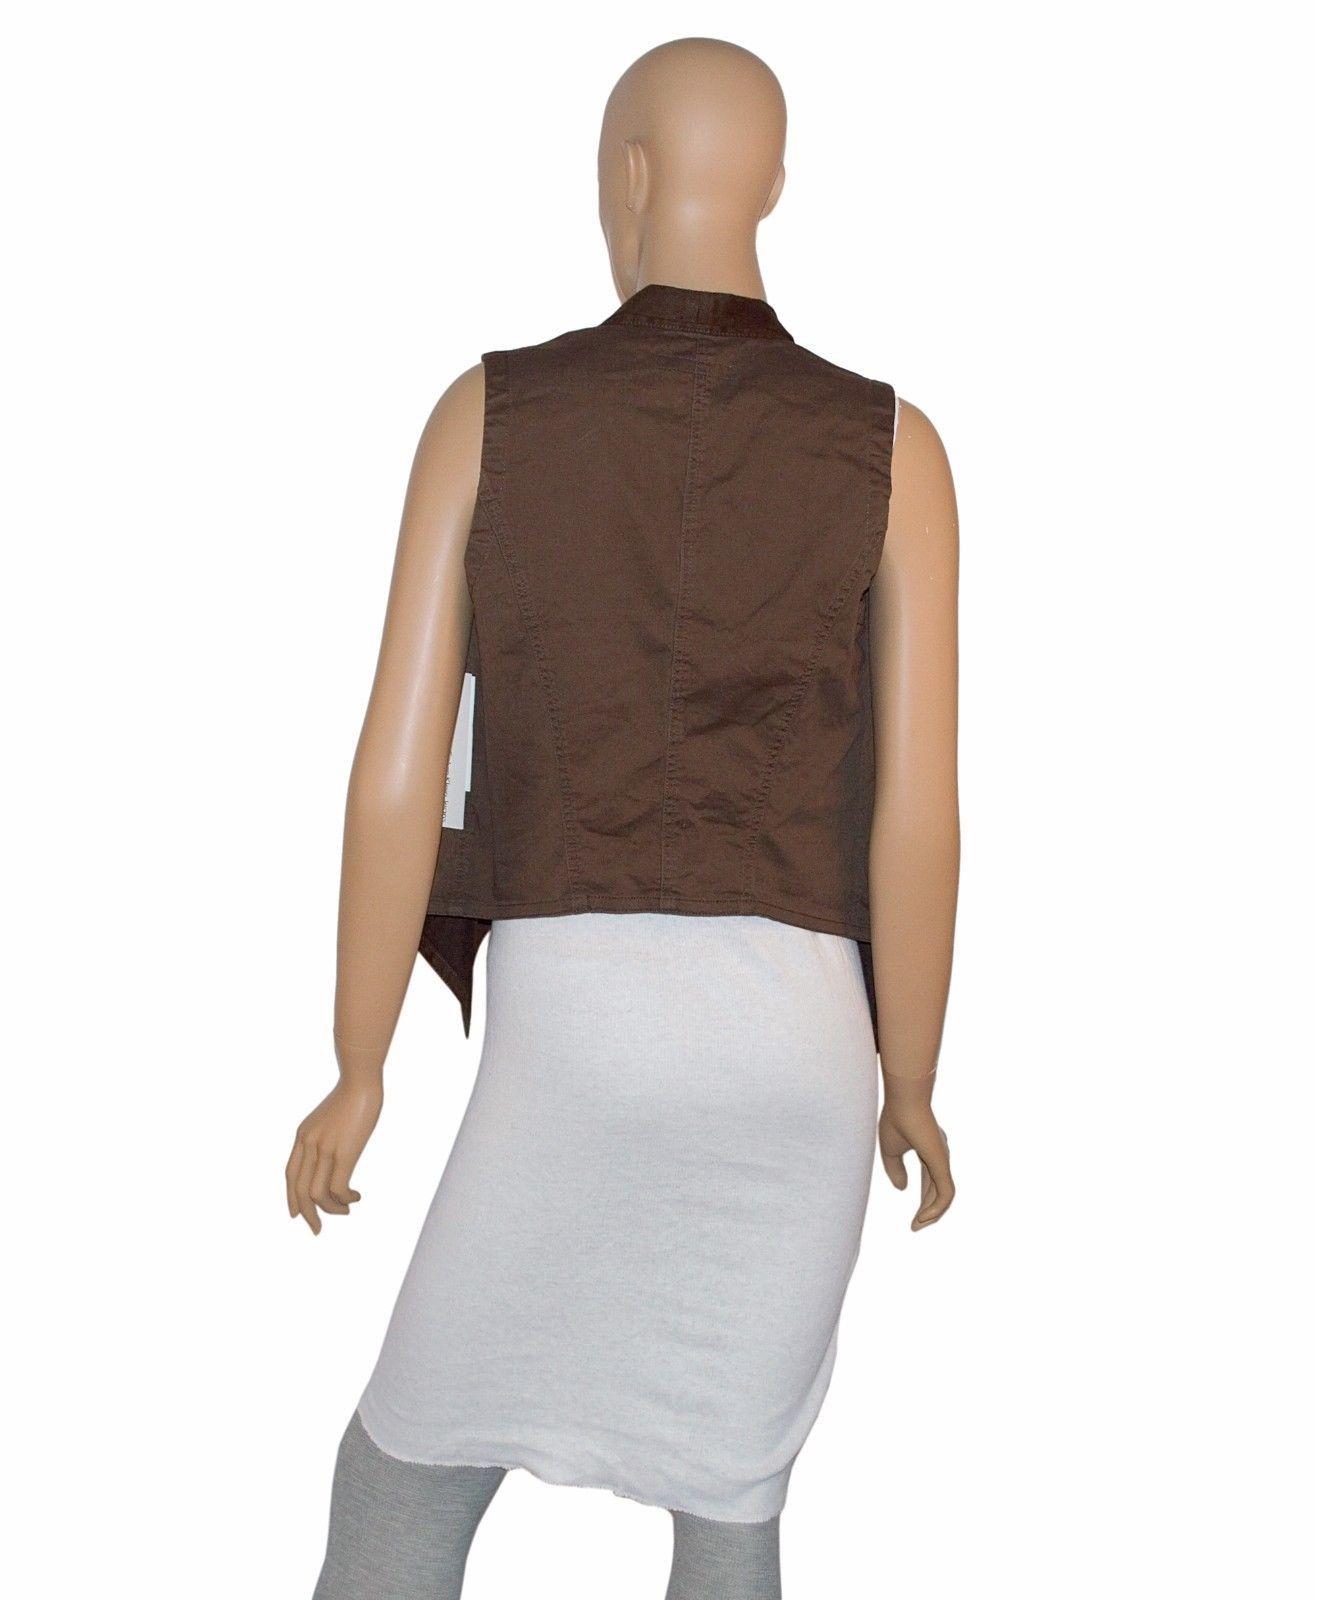 Calvin Klein Jeans Women's Vest Top Slate Brown Cotton Size Small $79.50